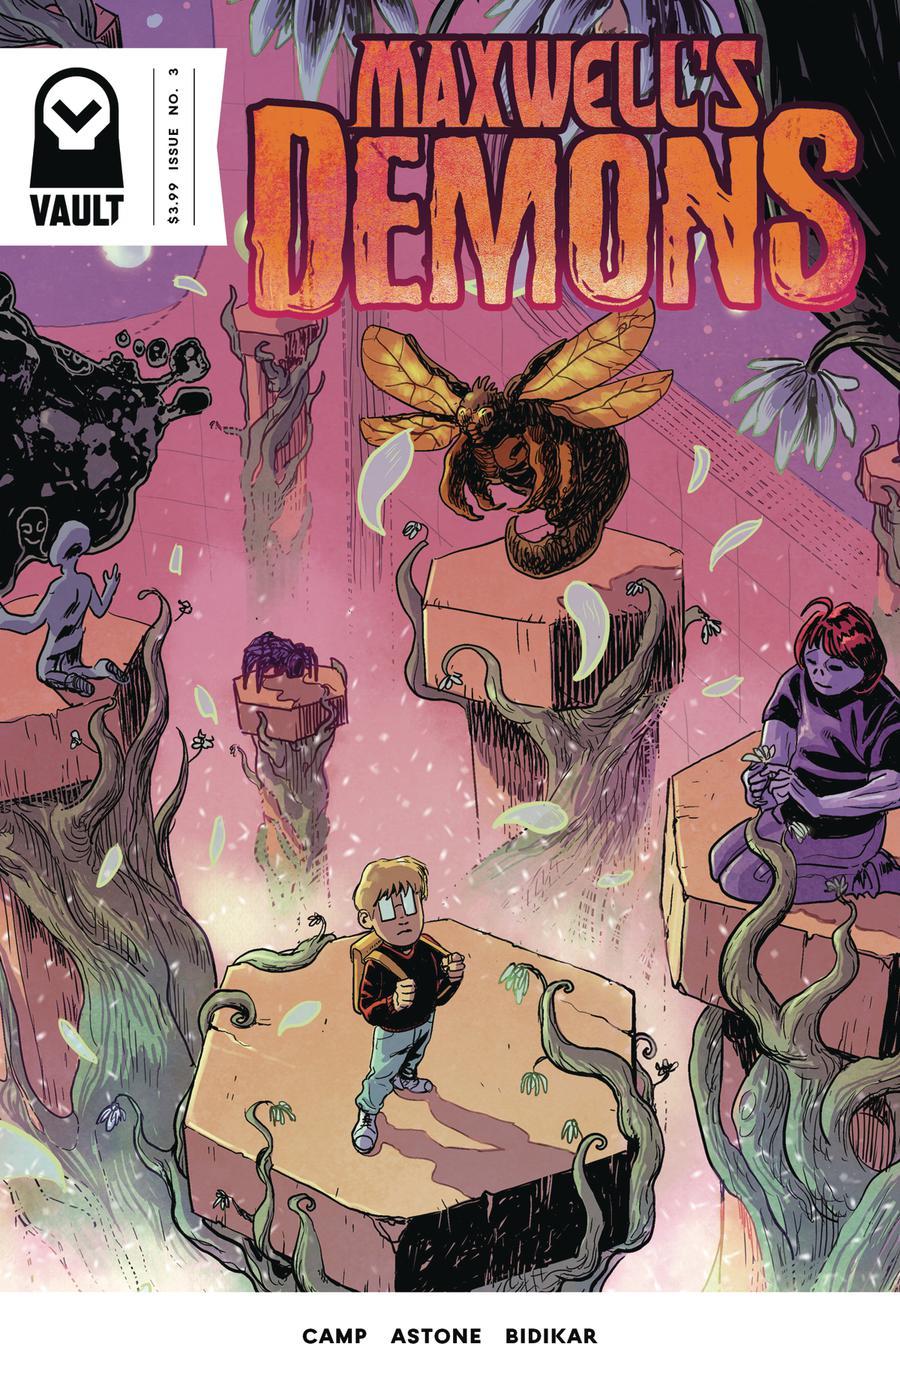 Maxwells Demons #3